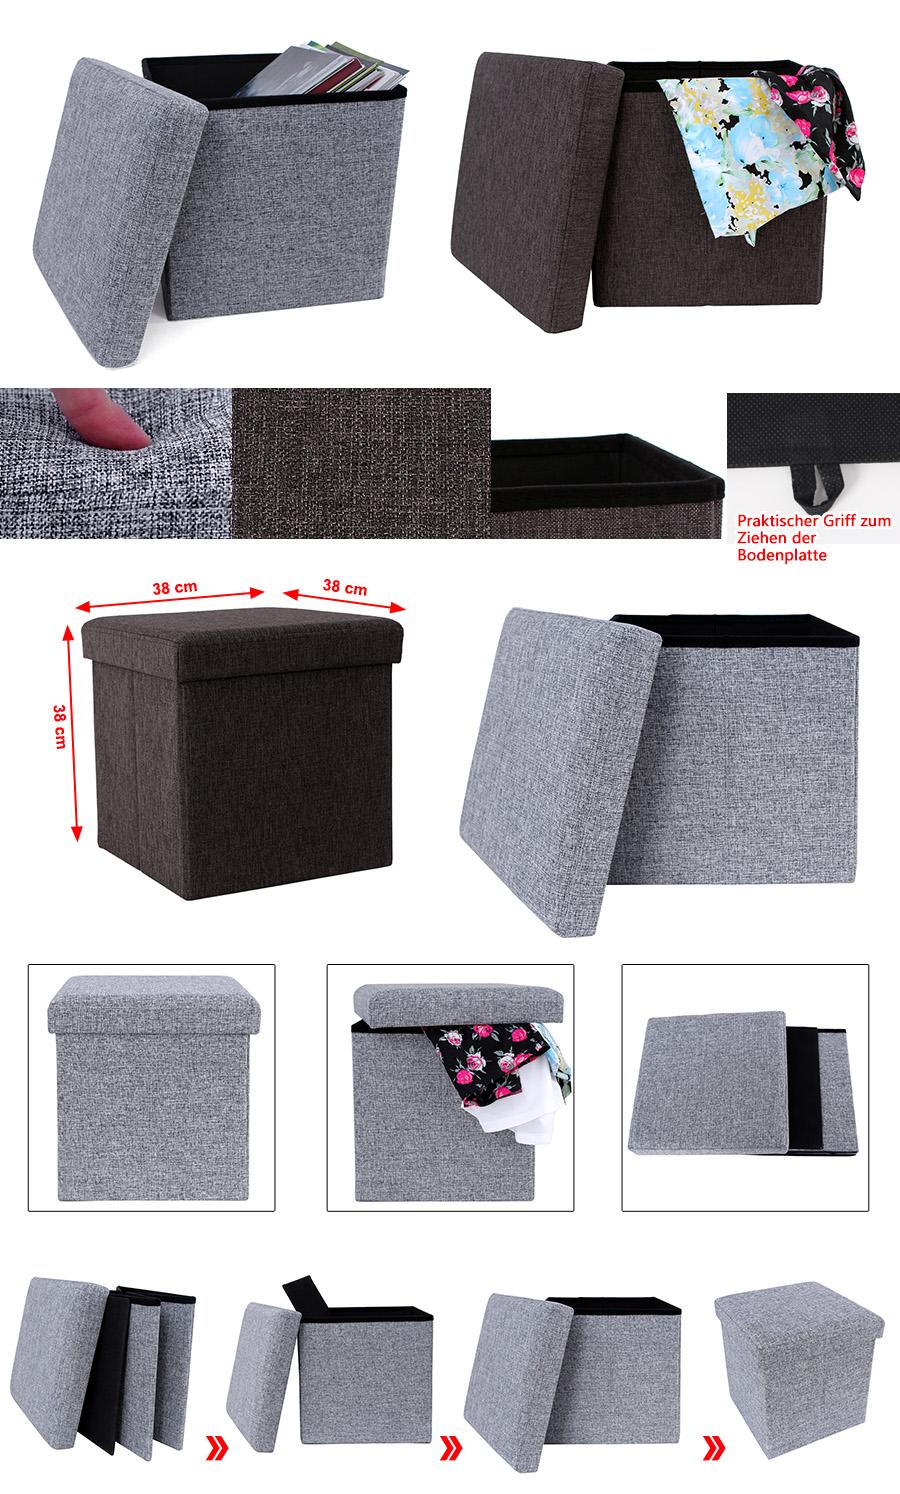 38x38x38 cm new foldable folding storage ottoman pouffe seat stool chest toy box ebay